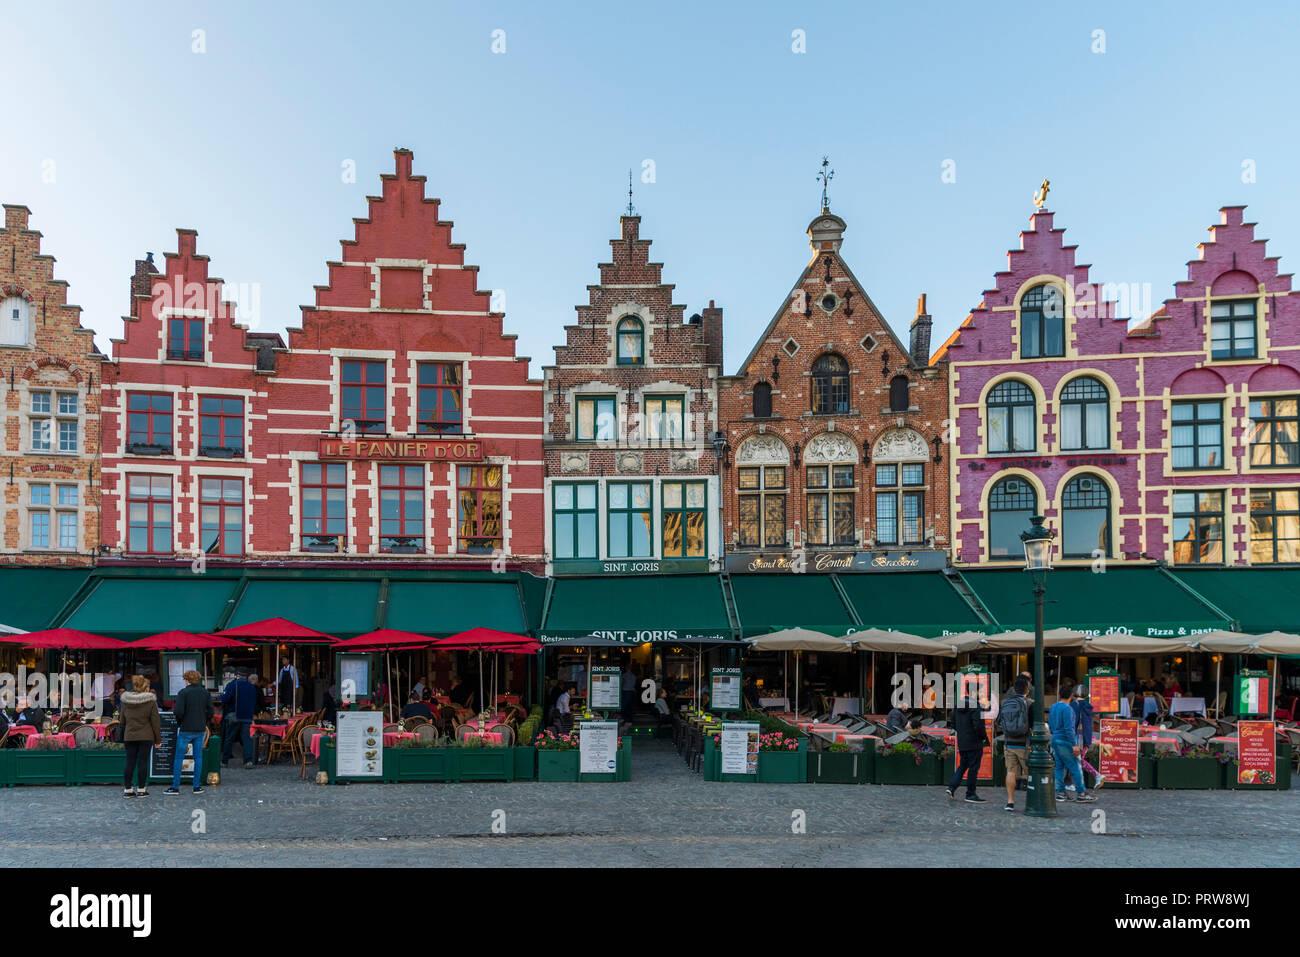 Markt Square of Brugge - Stock Image